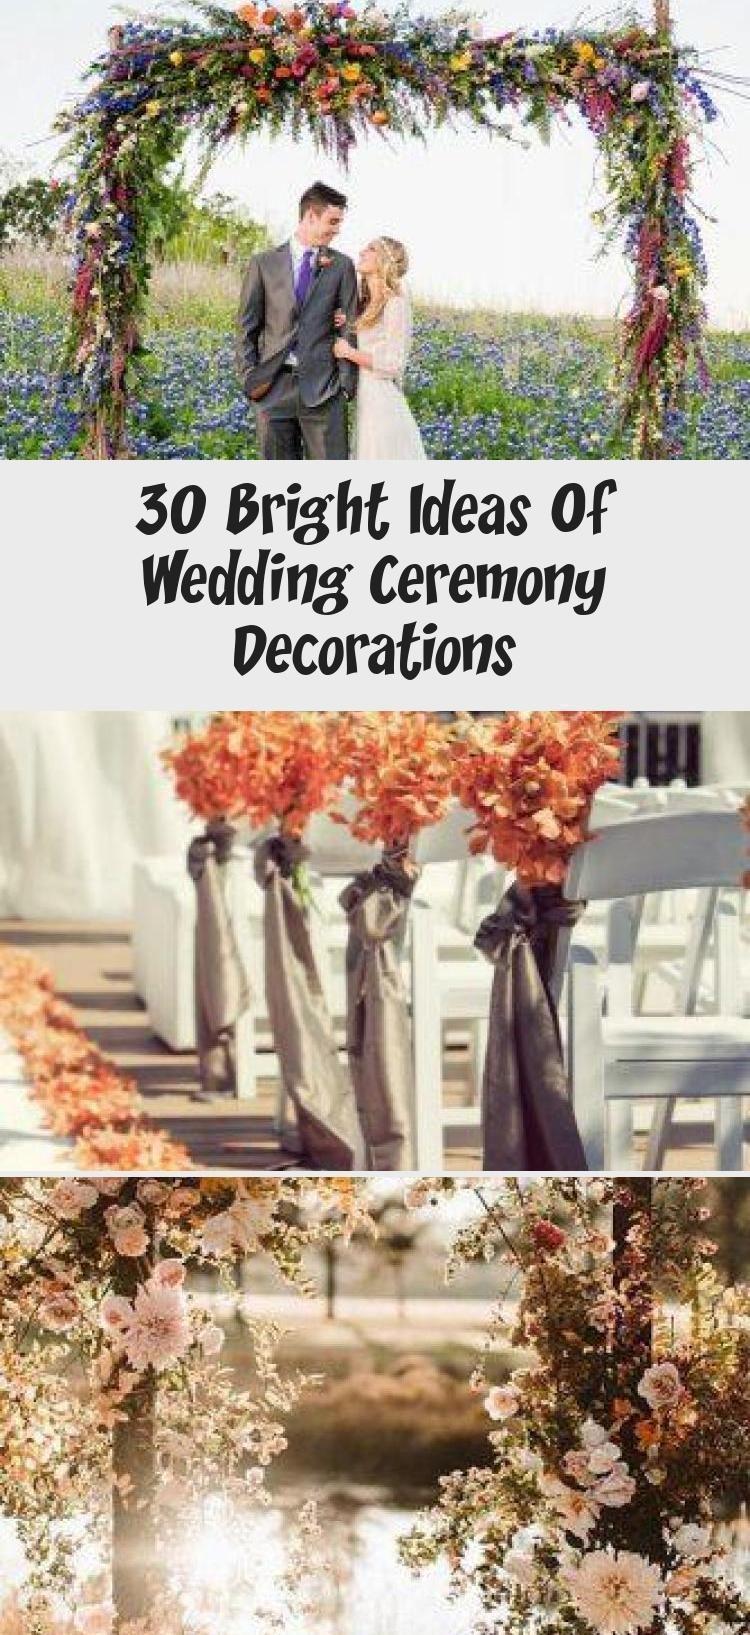 30 Bright Ideas Of Wedding Ceremony Decorations - Wedding 30 Bright Ideas Of Wed | summer outdoor wedding ceremony aisle decorations #bright #ceremony #decorations #ideas #wed #wedding